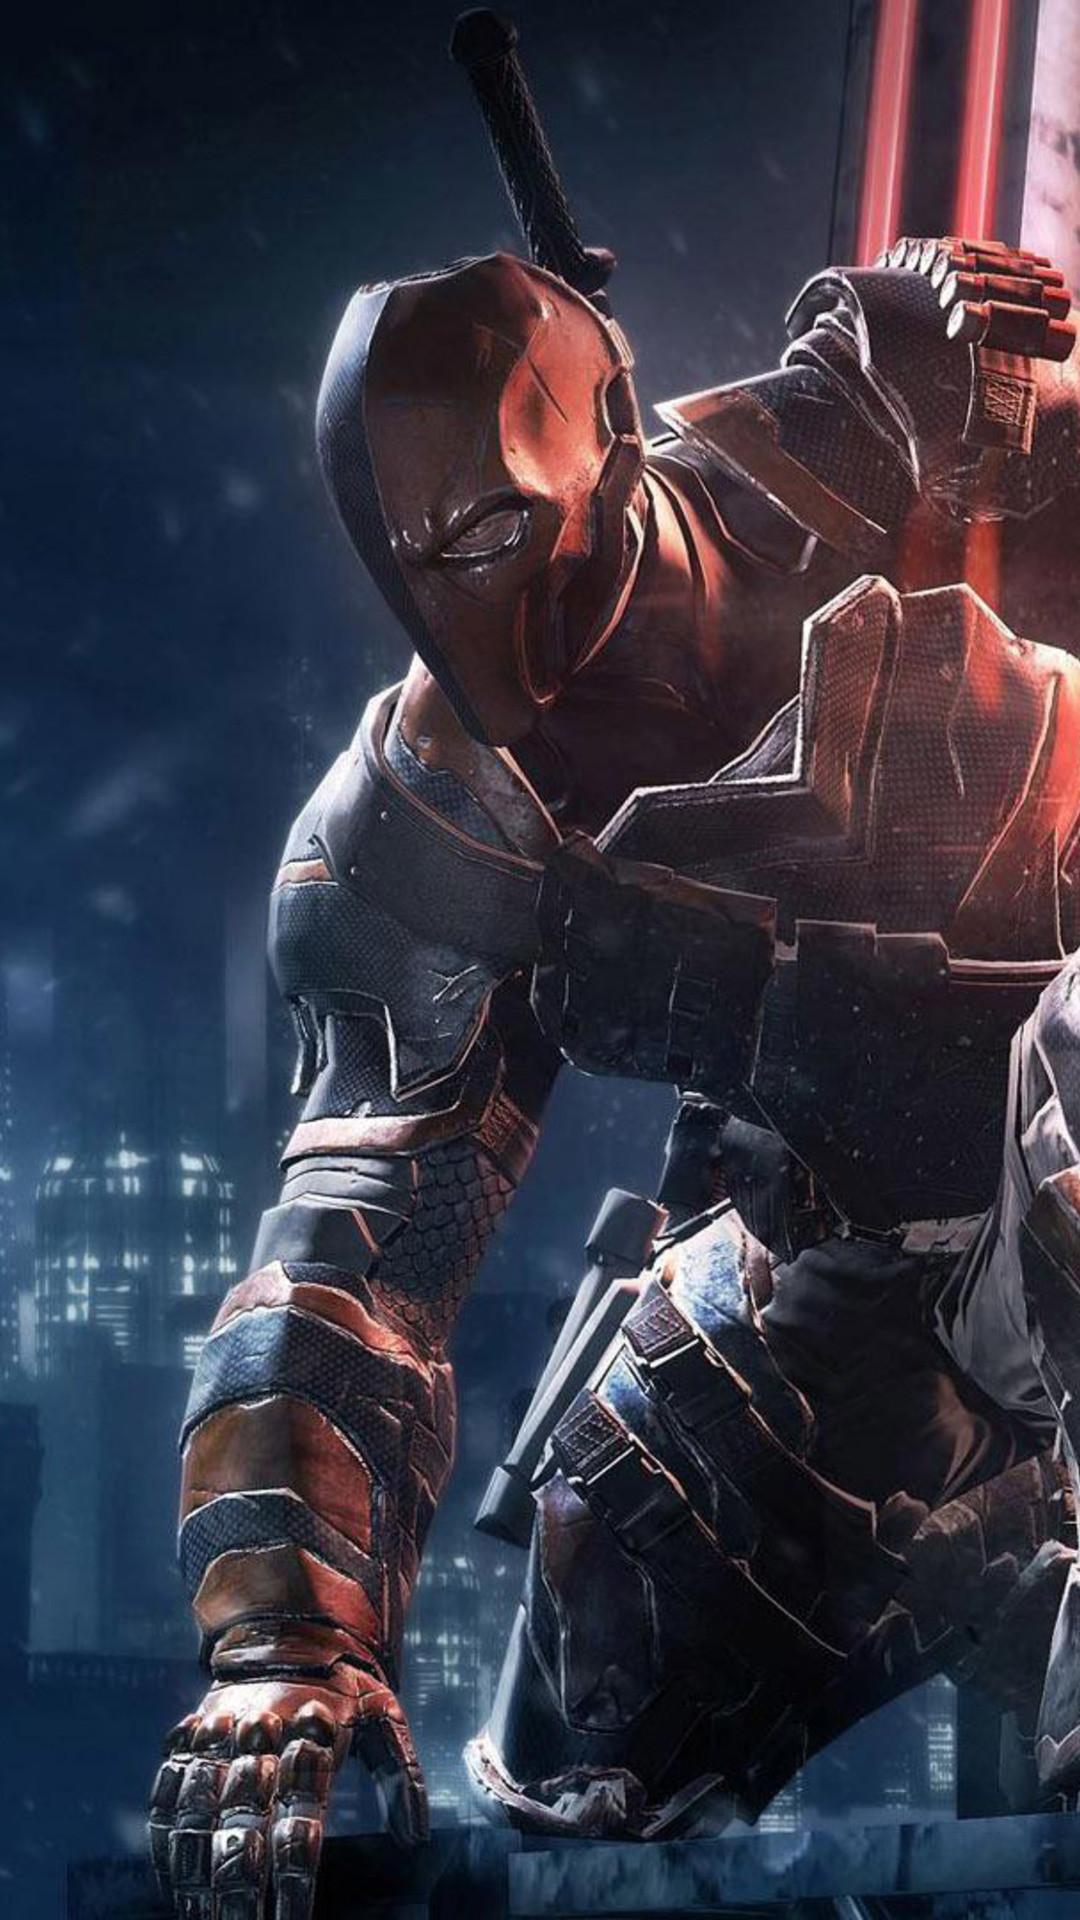 Batman <b>Arkham Origins Wallpaper HD</b> – WallpaperSafari